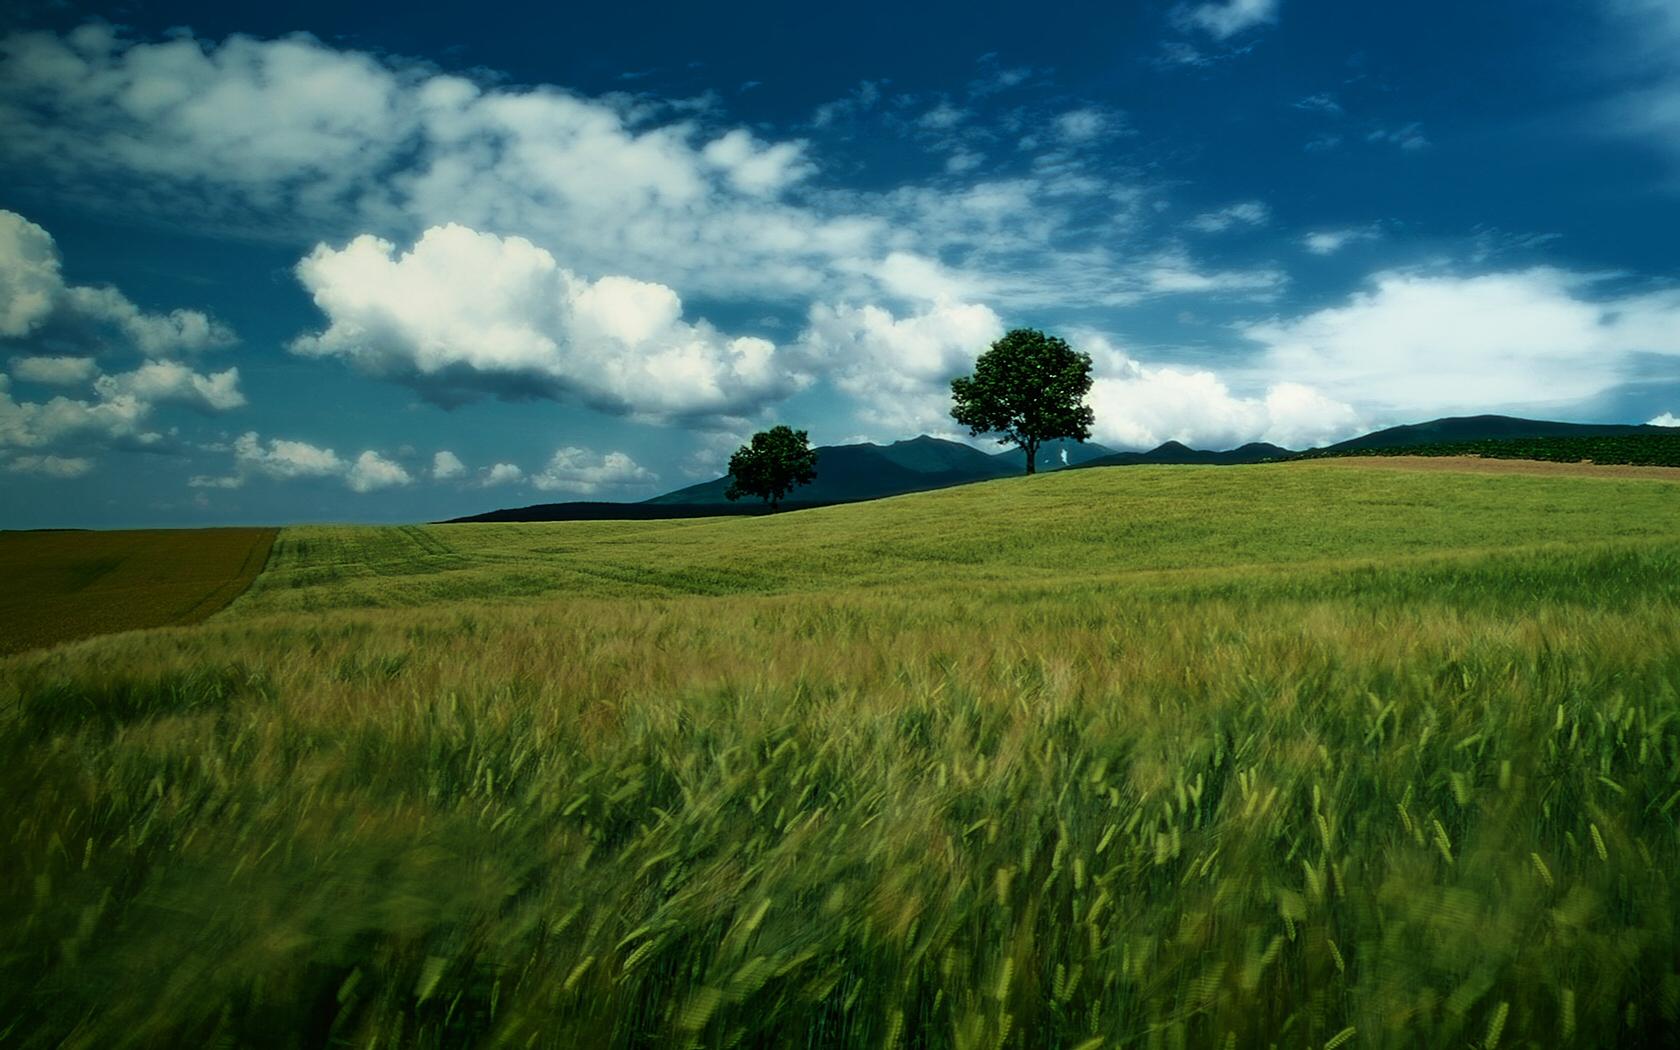 Fields Wallpaper - WallpaperSafari